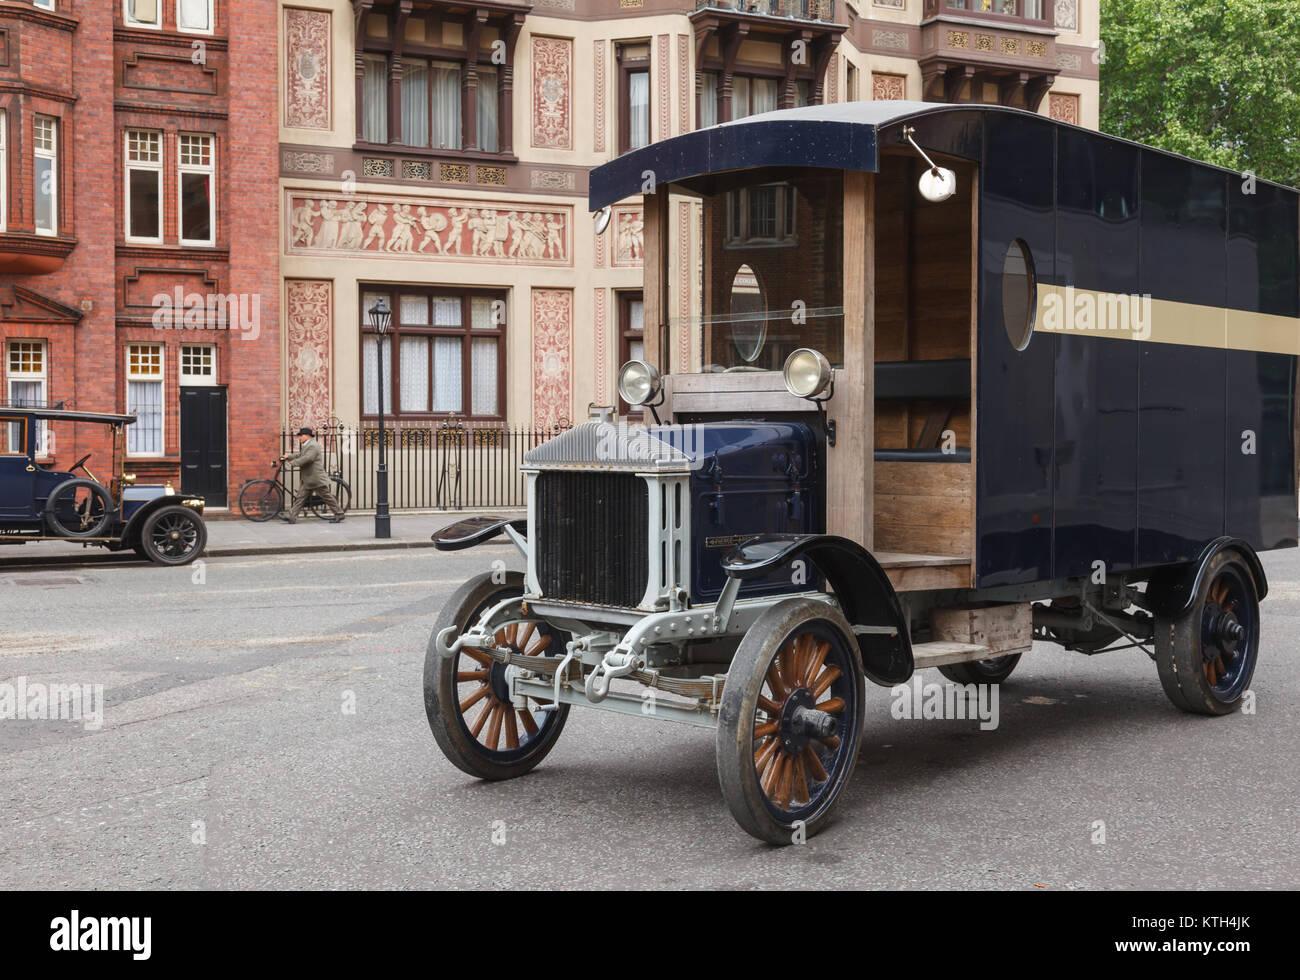 LONDON, UK, 17. JUNI 2013: retro Film Szene mit Oldtimer Autos auf einer Straße Stockbild